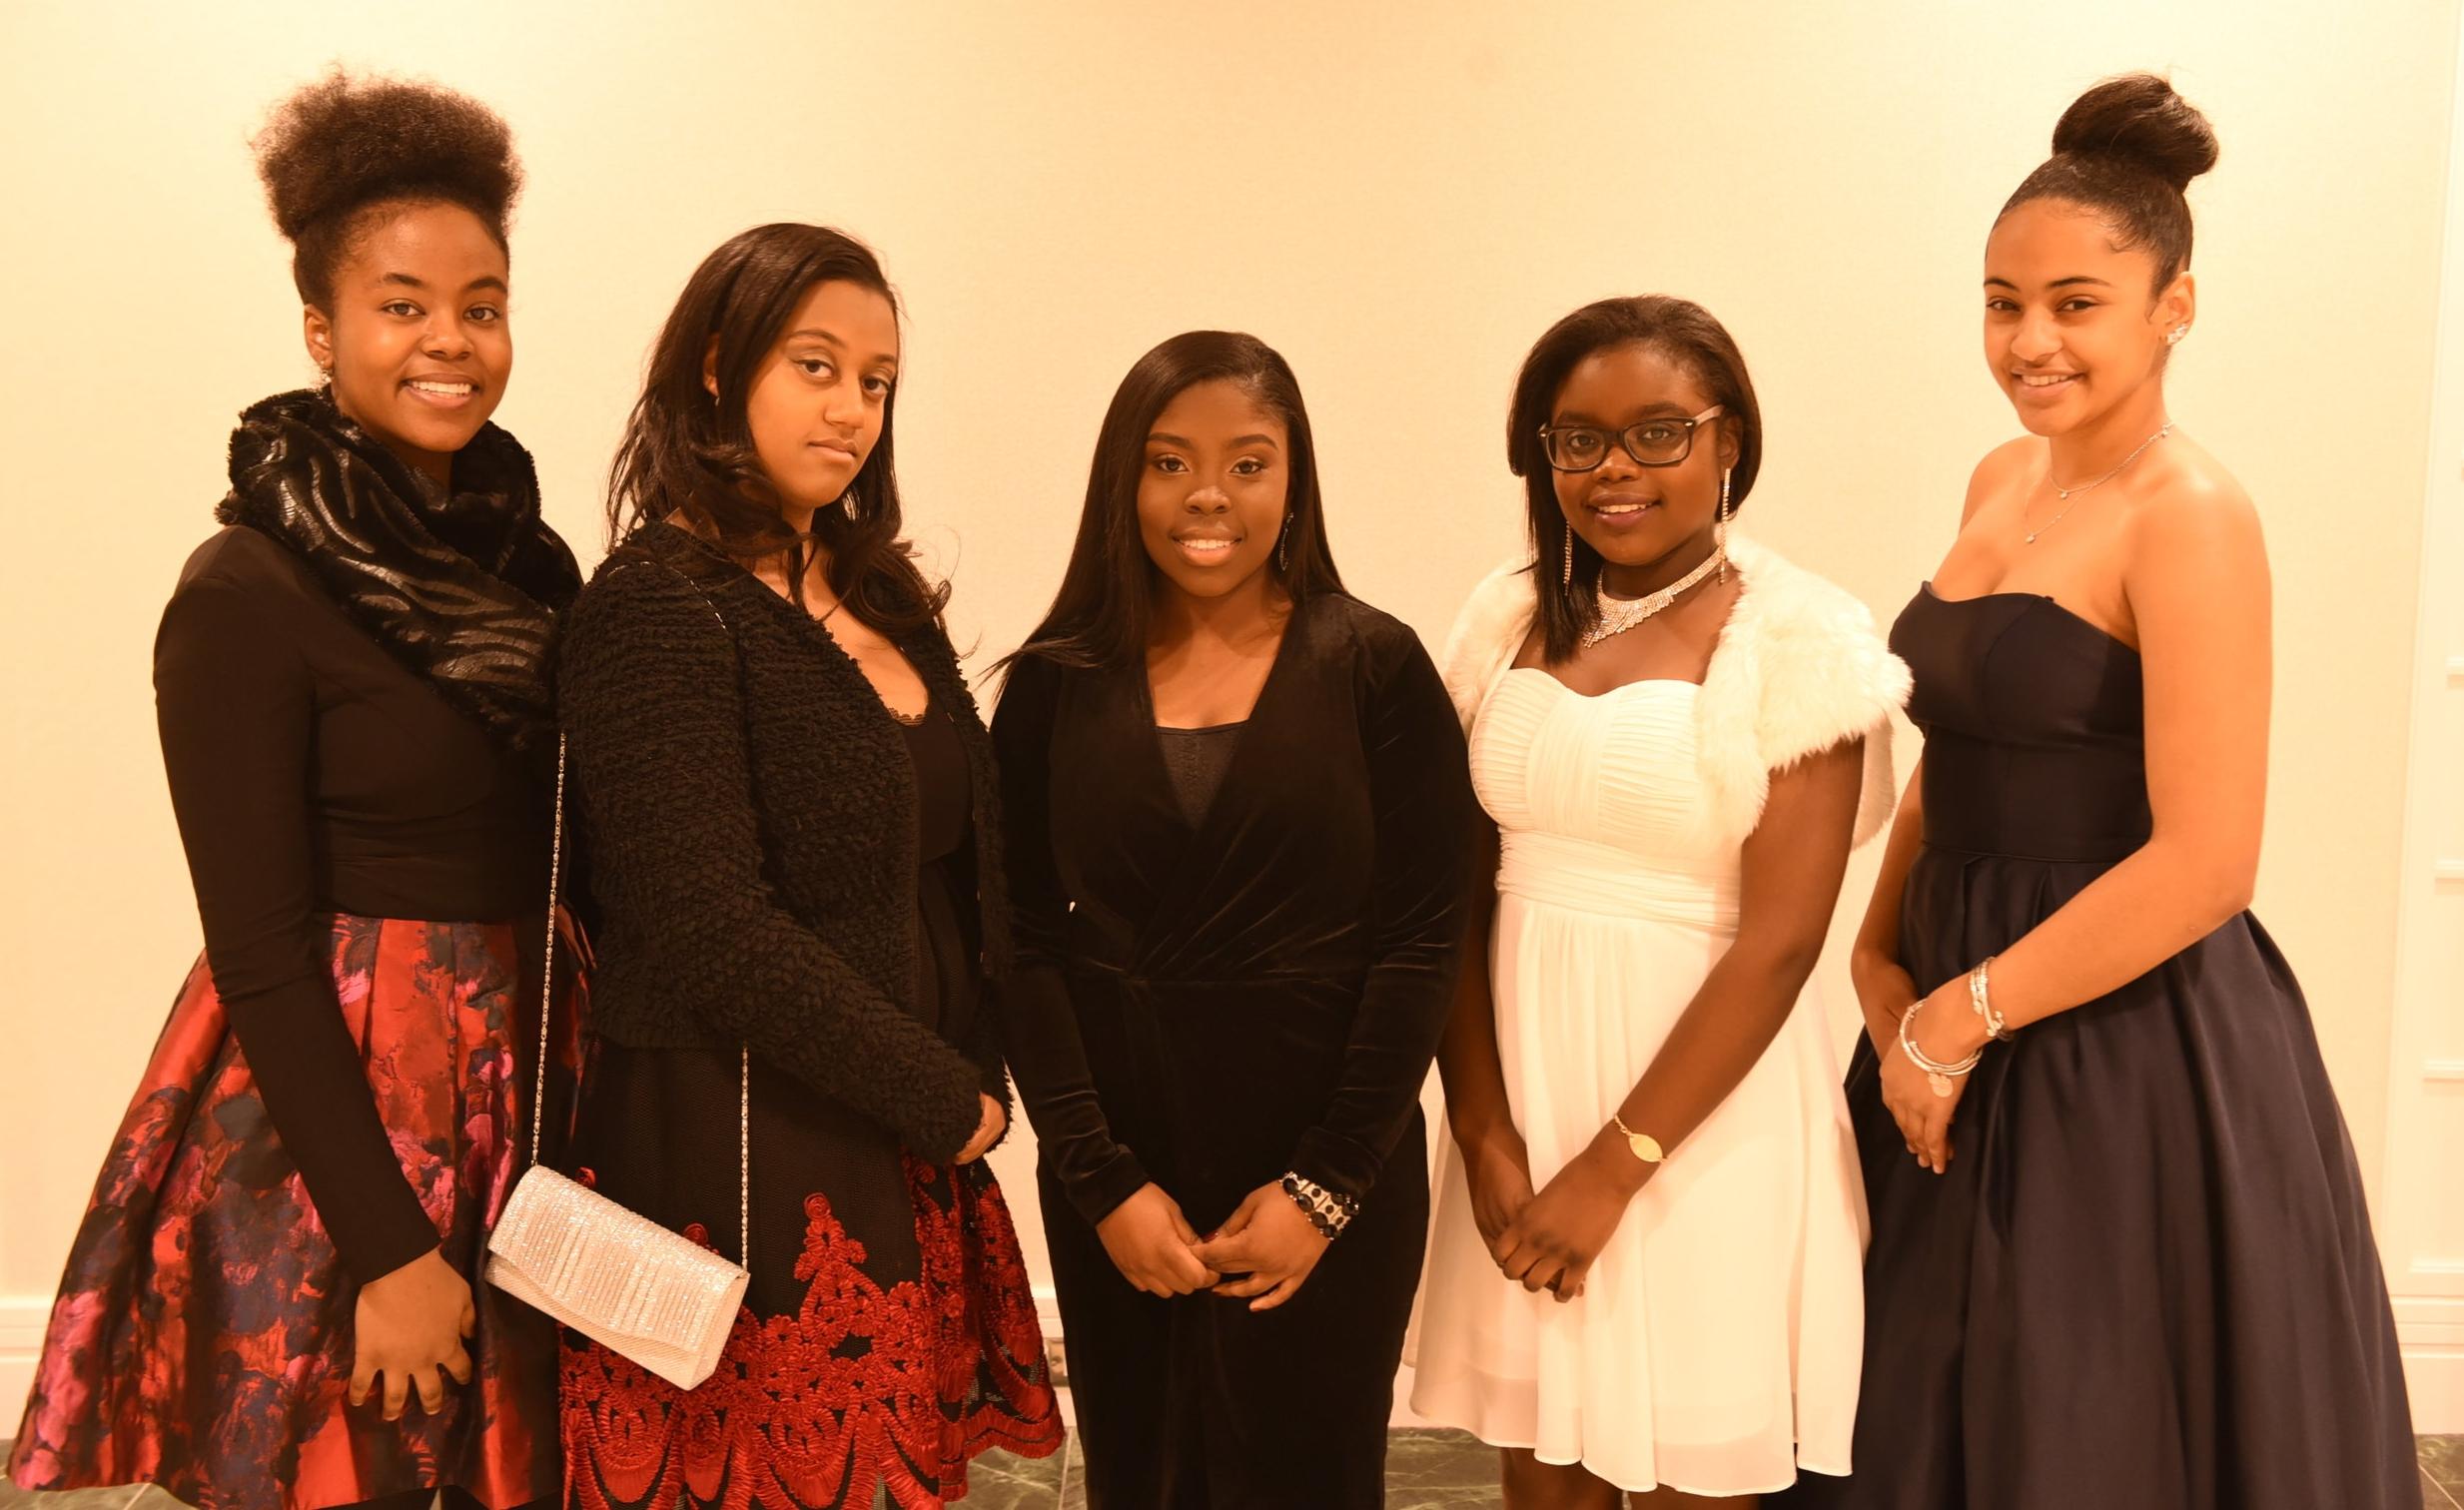 Zabrina Kerr (l), Sarah Douglas, Isabel Asuako, Danielle Hassan & Keyareh Drakes